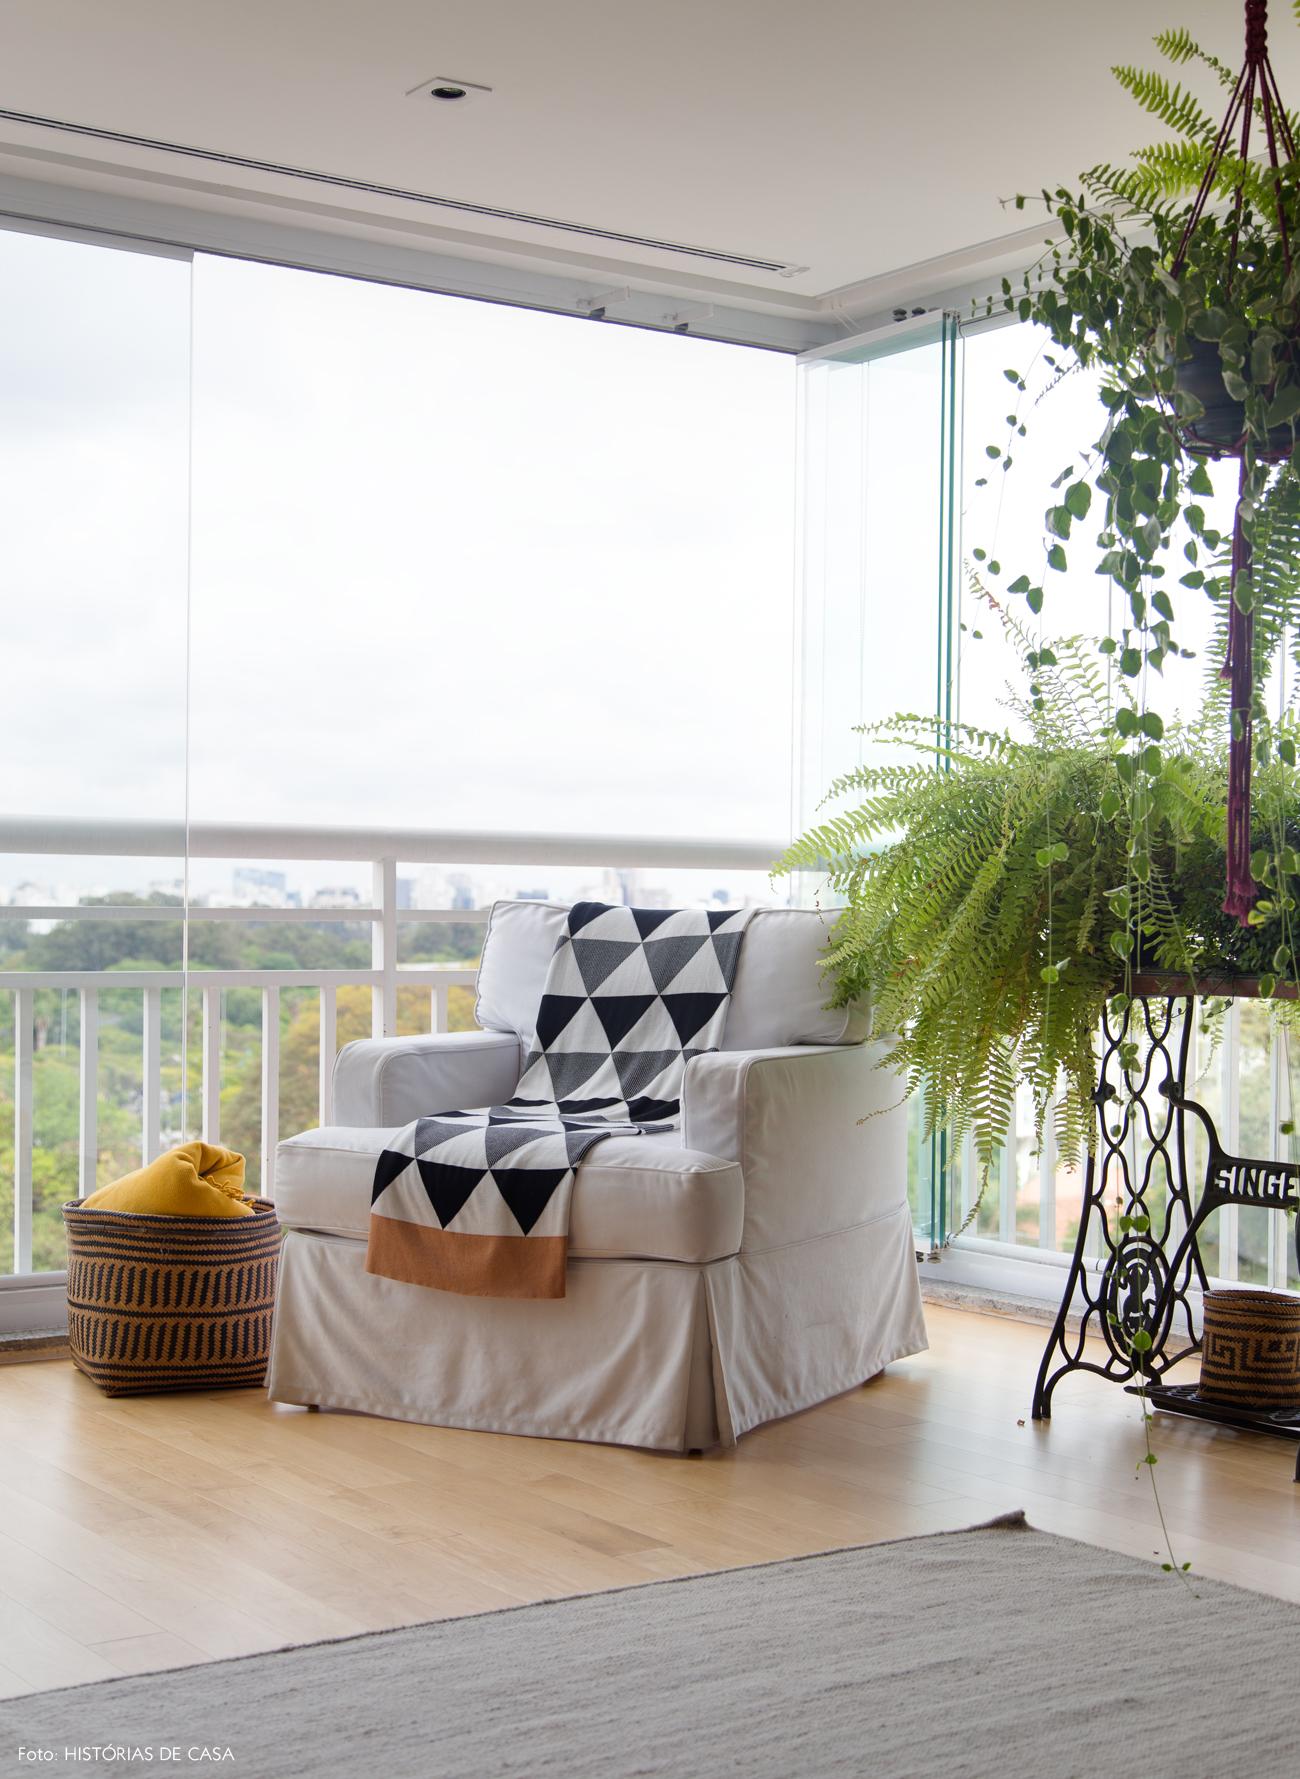 16-decoracao-apartamento-varanda-integrada-plantas-jardim-interno